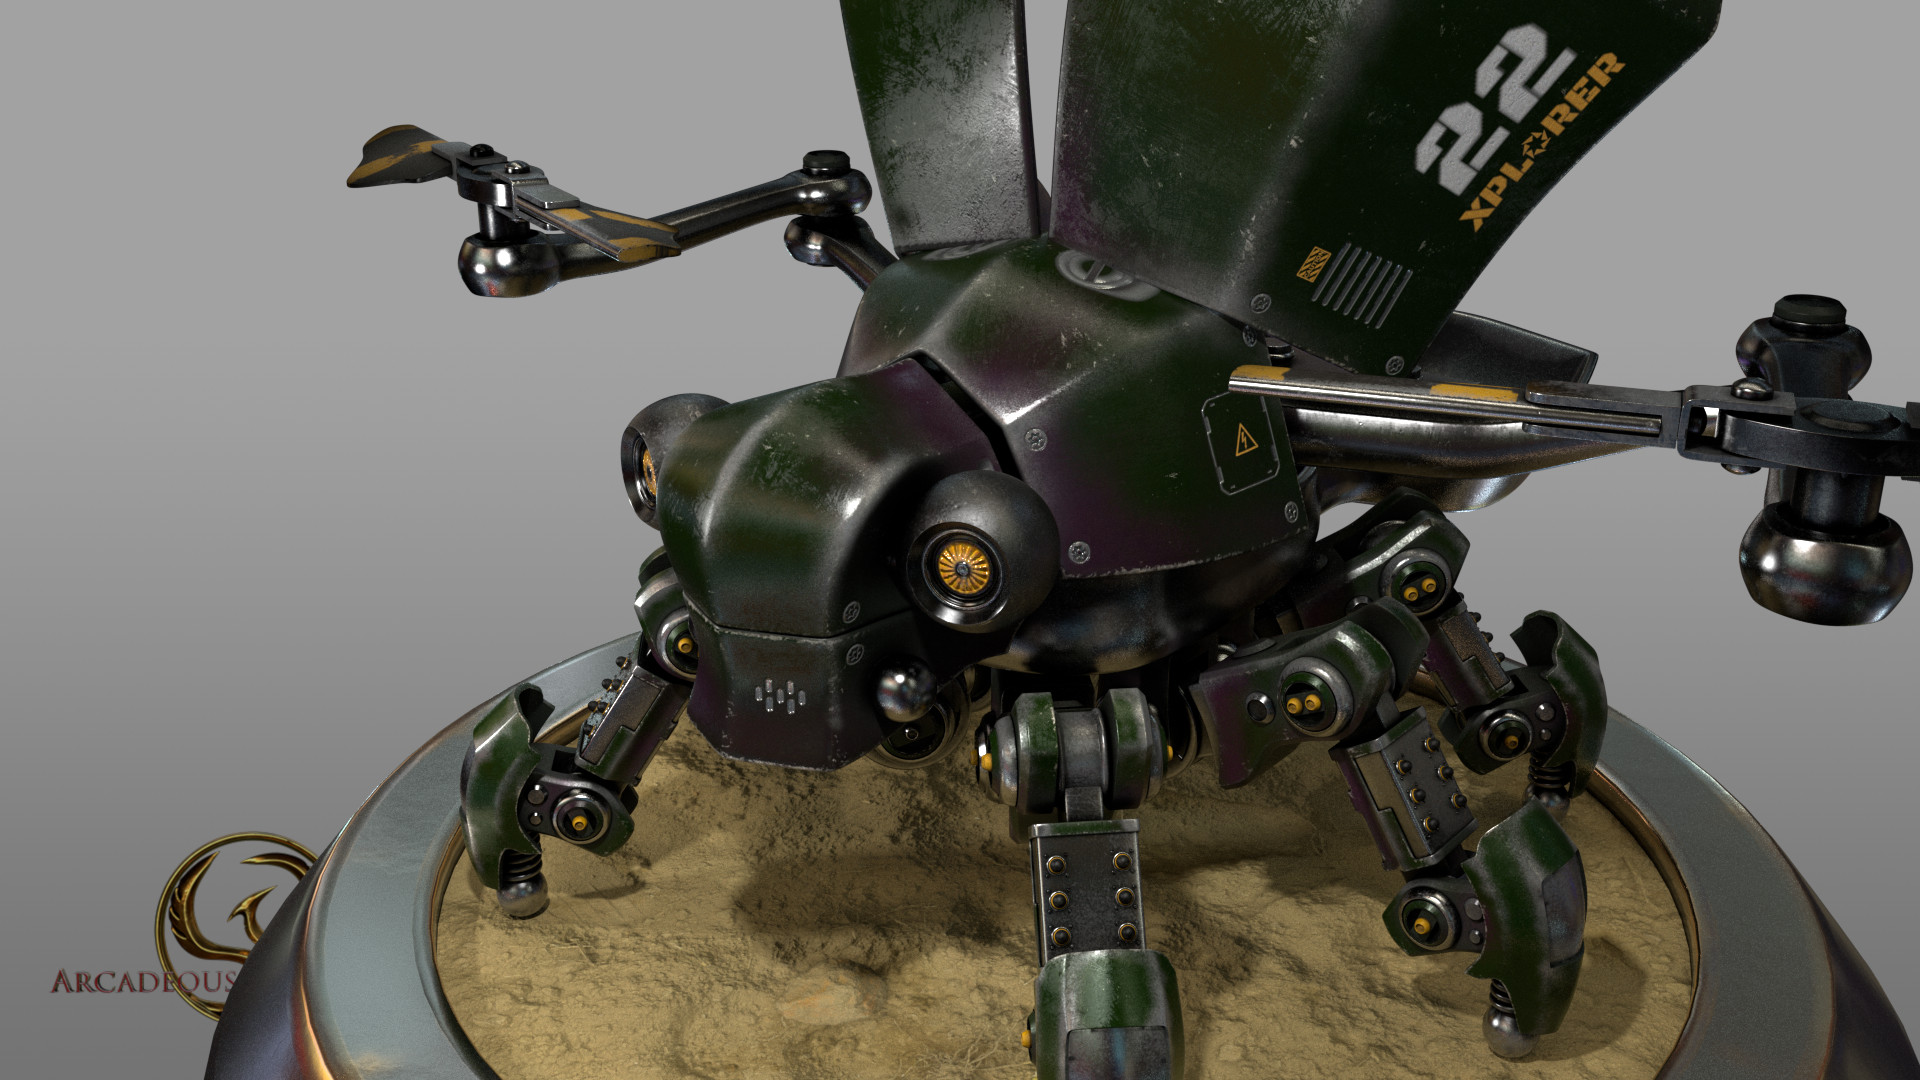 Arcadeous phoenix scarab weathered 3